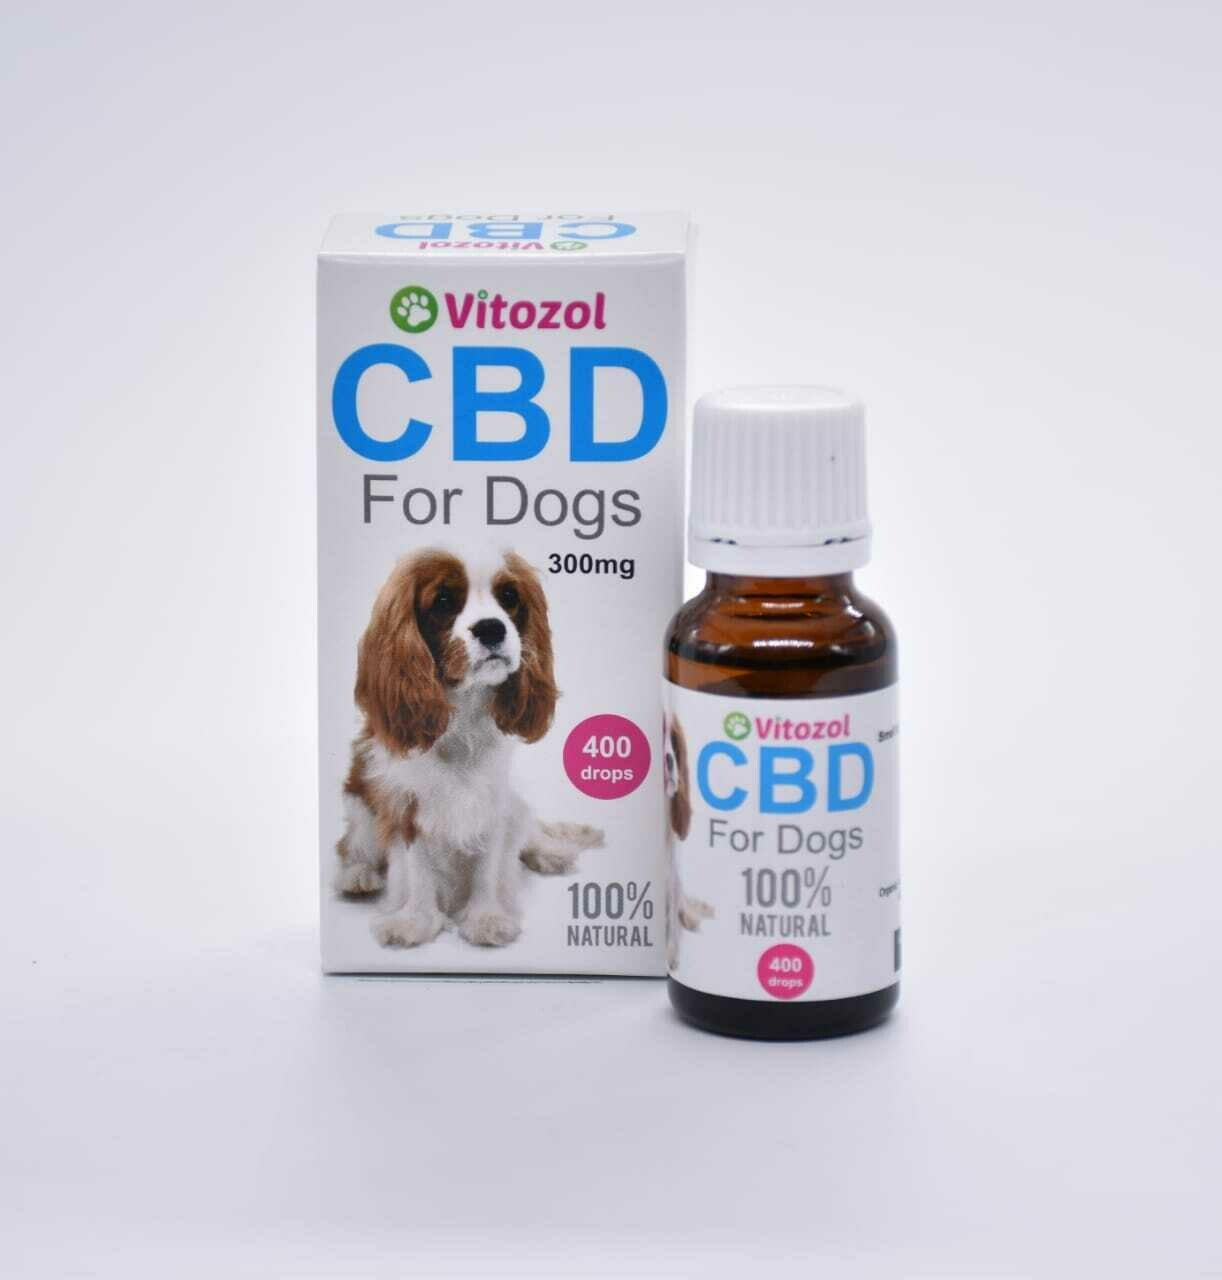 Vitozol CBD Drops for Dogs